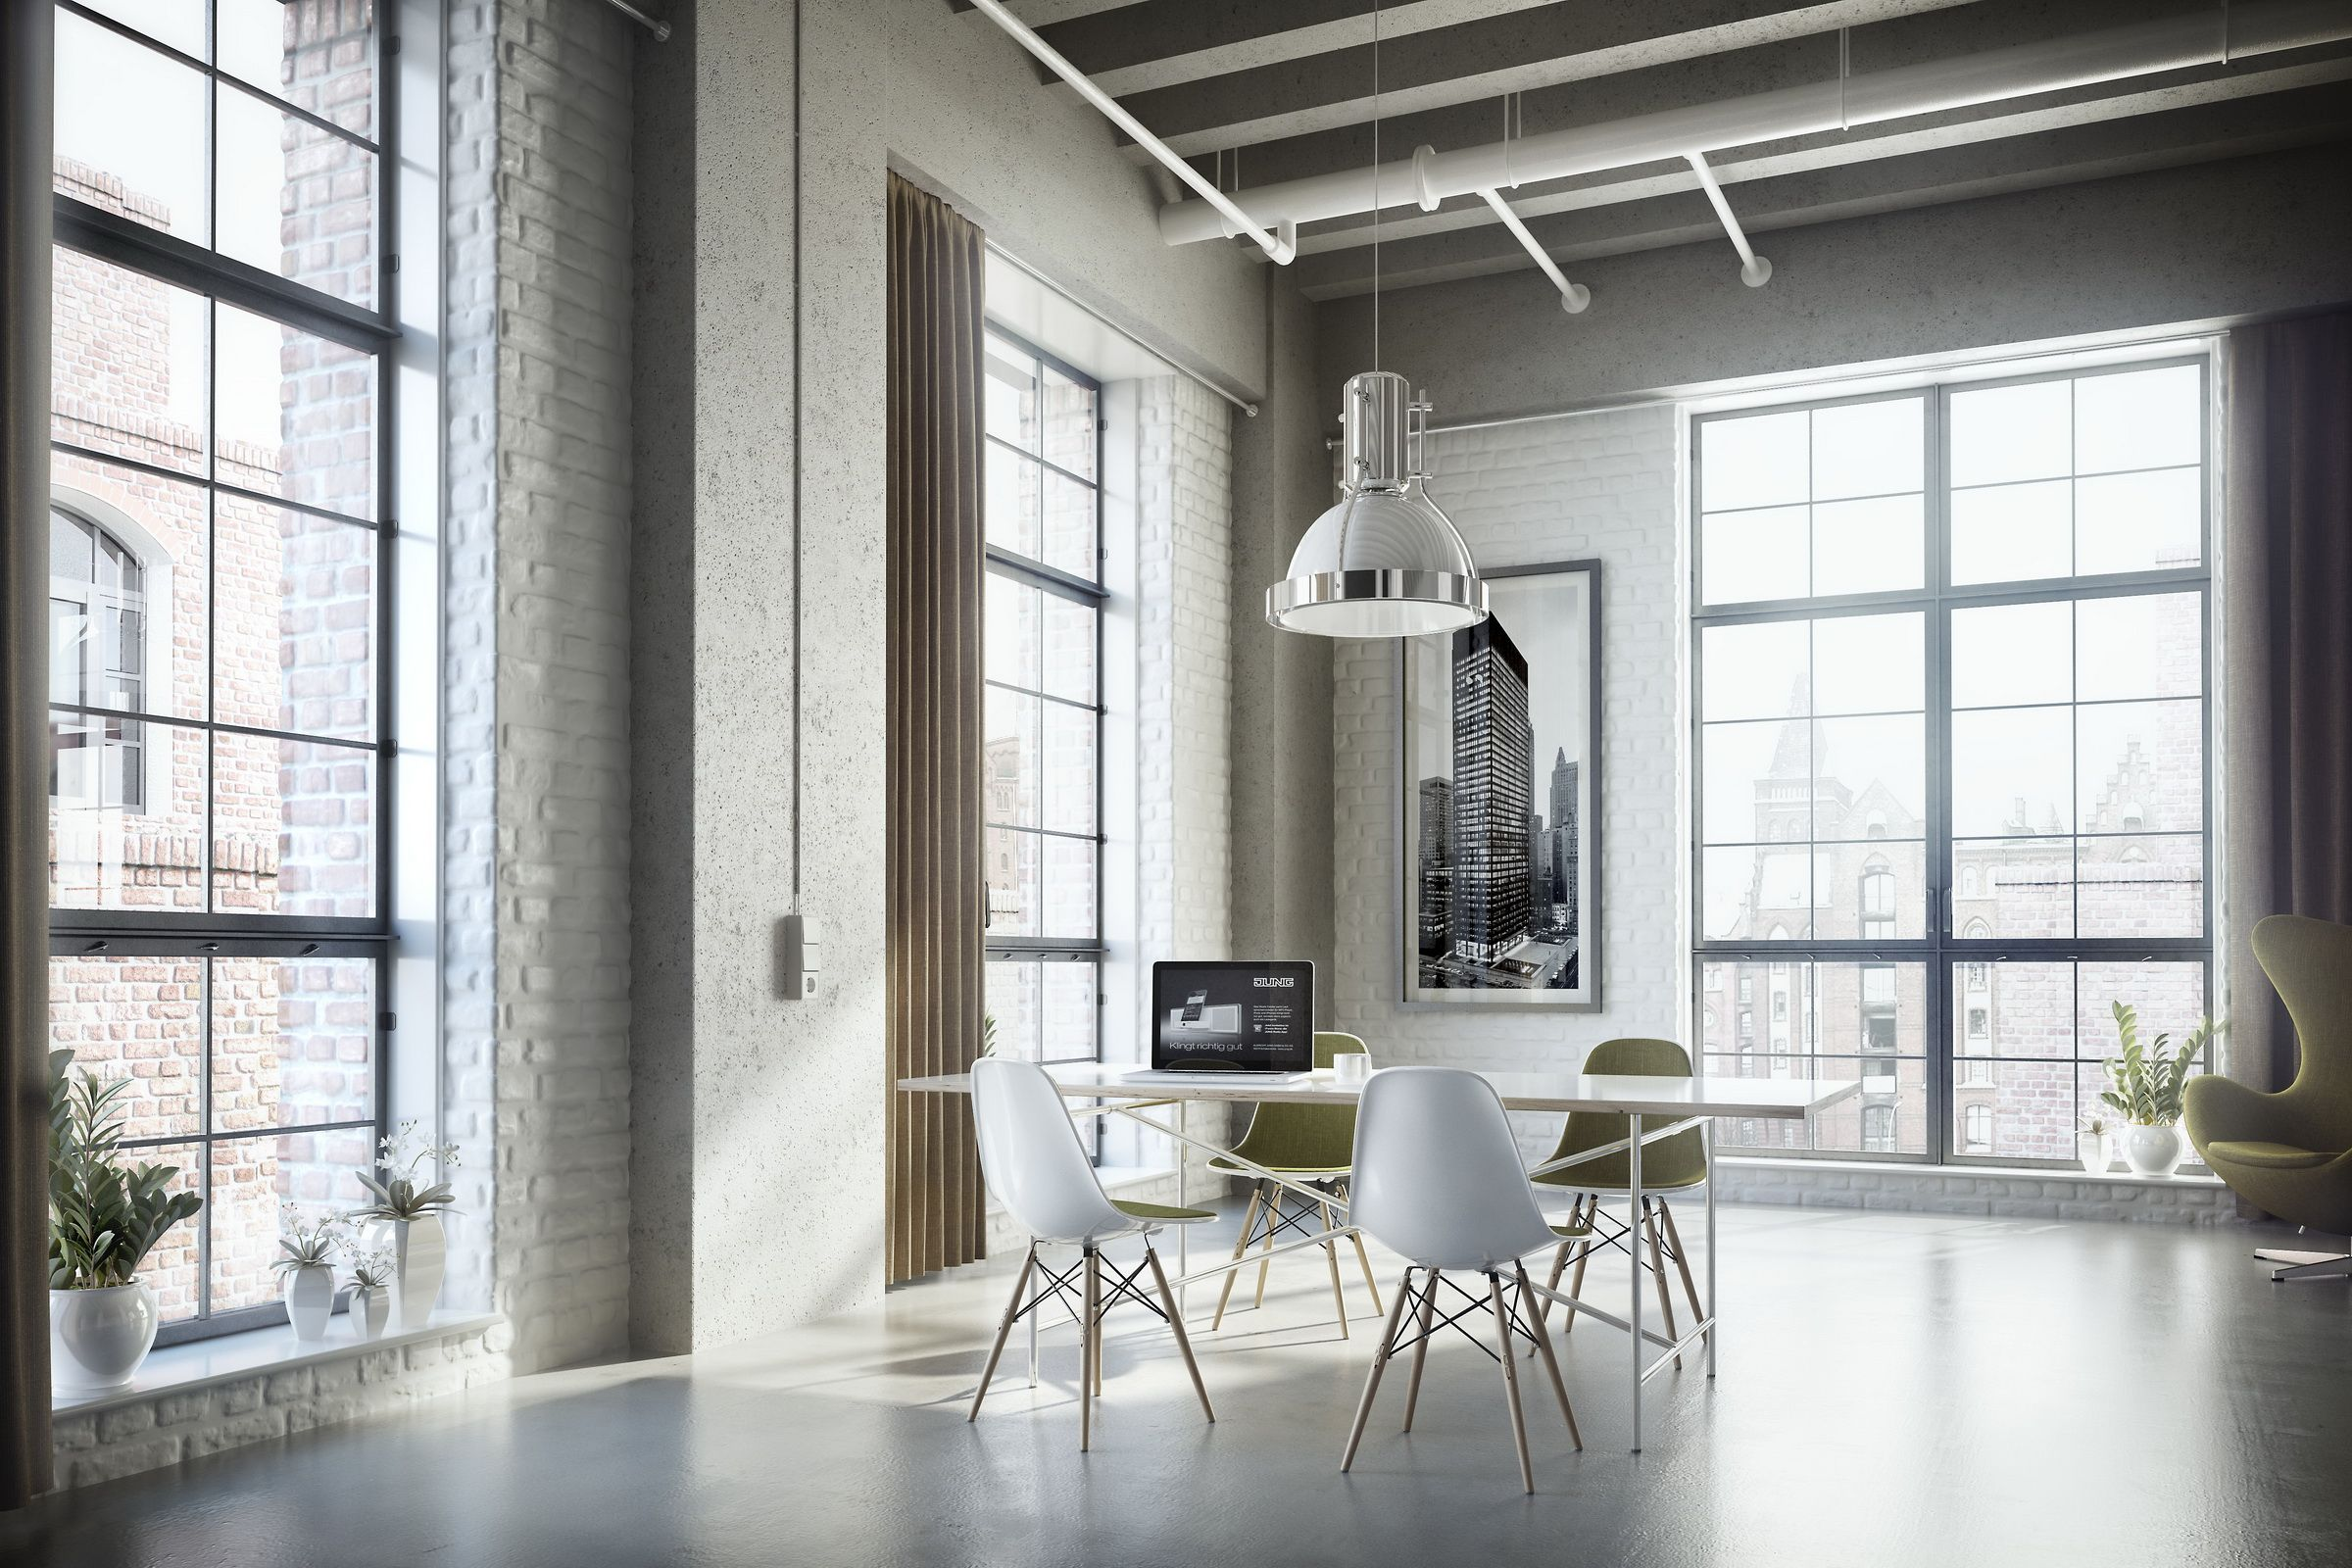 Jung_Light_Building_2012_Renderings ### jung_light_building_loft_120613_01